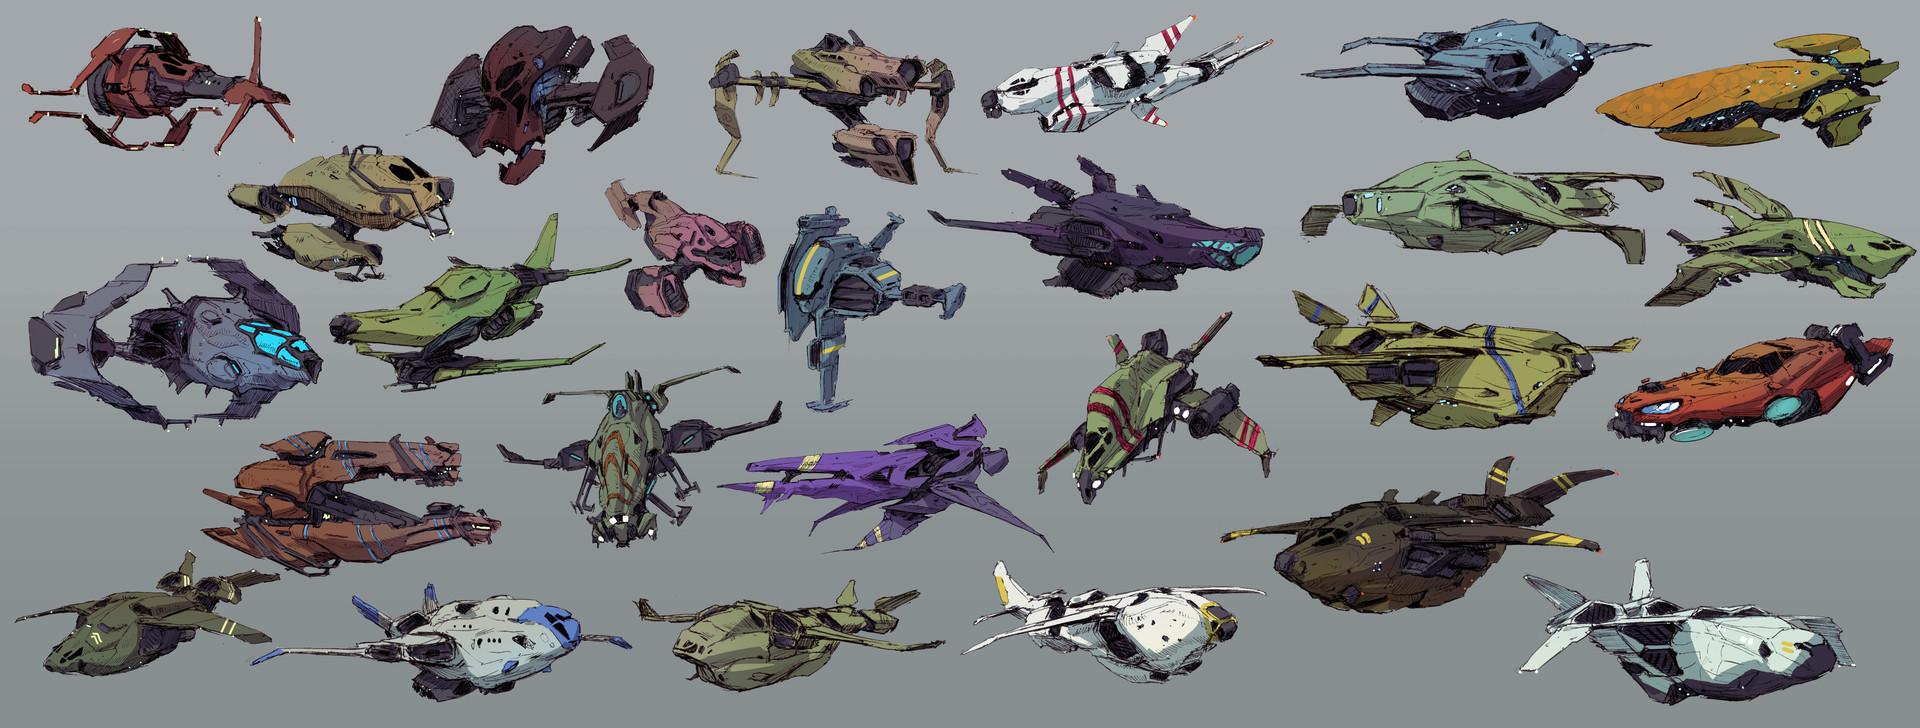 Brad wright spaceship thumbnails 02